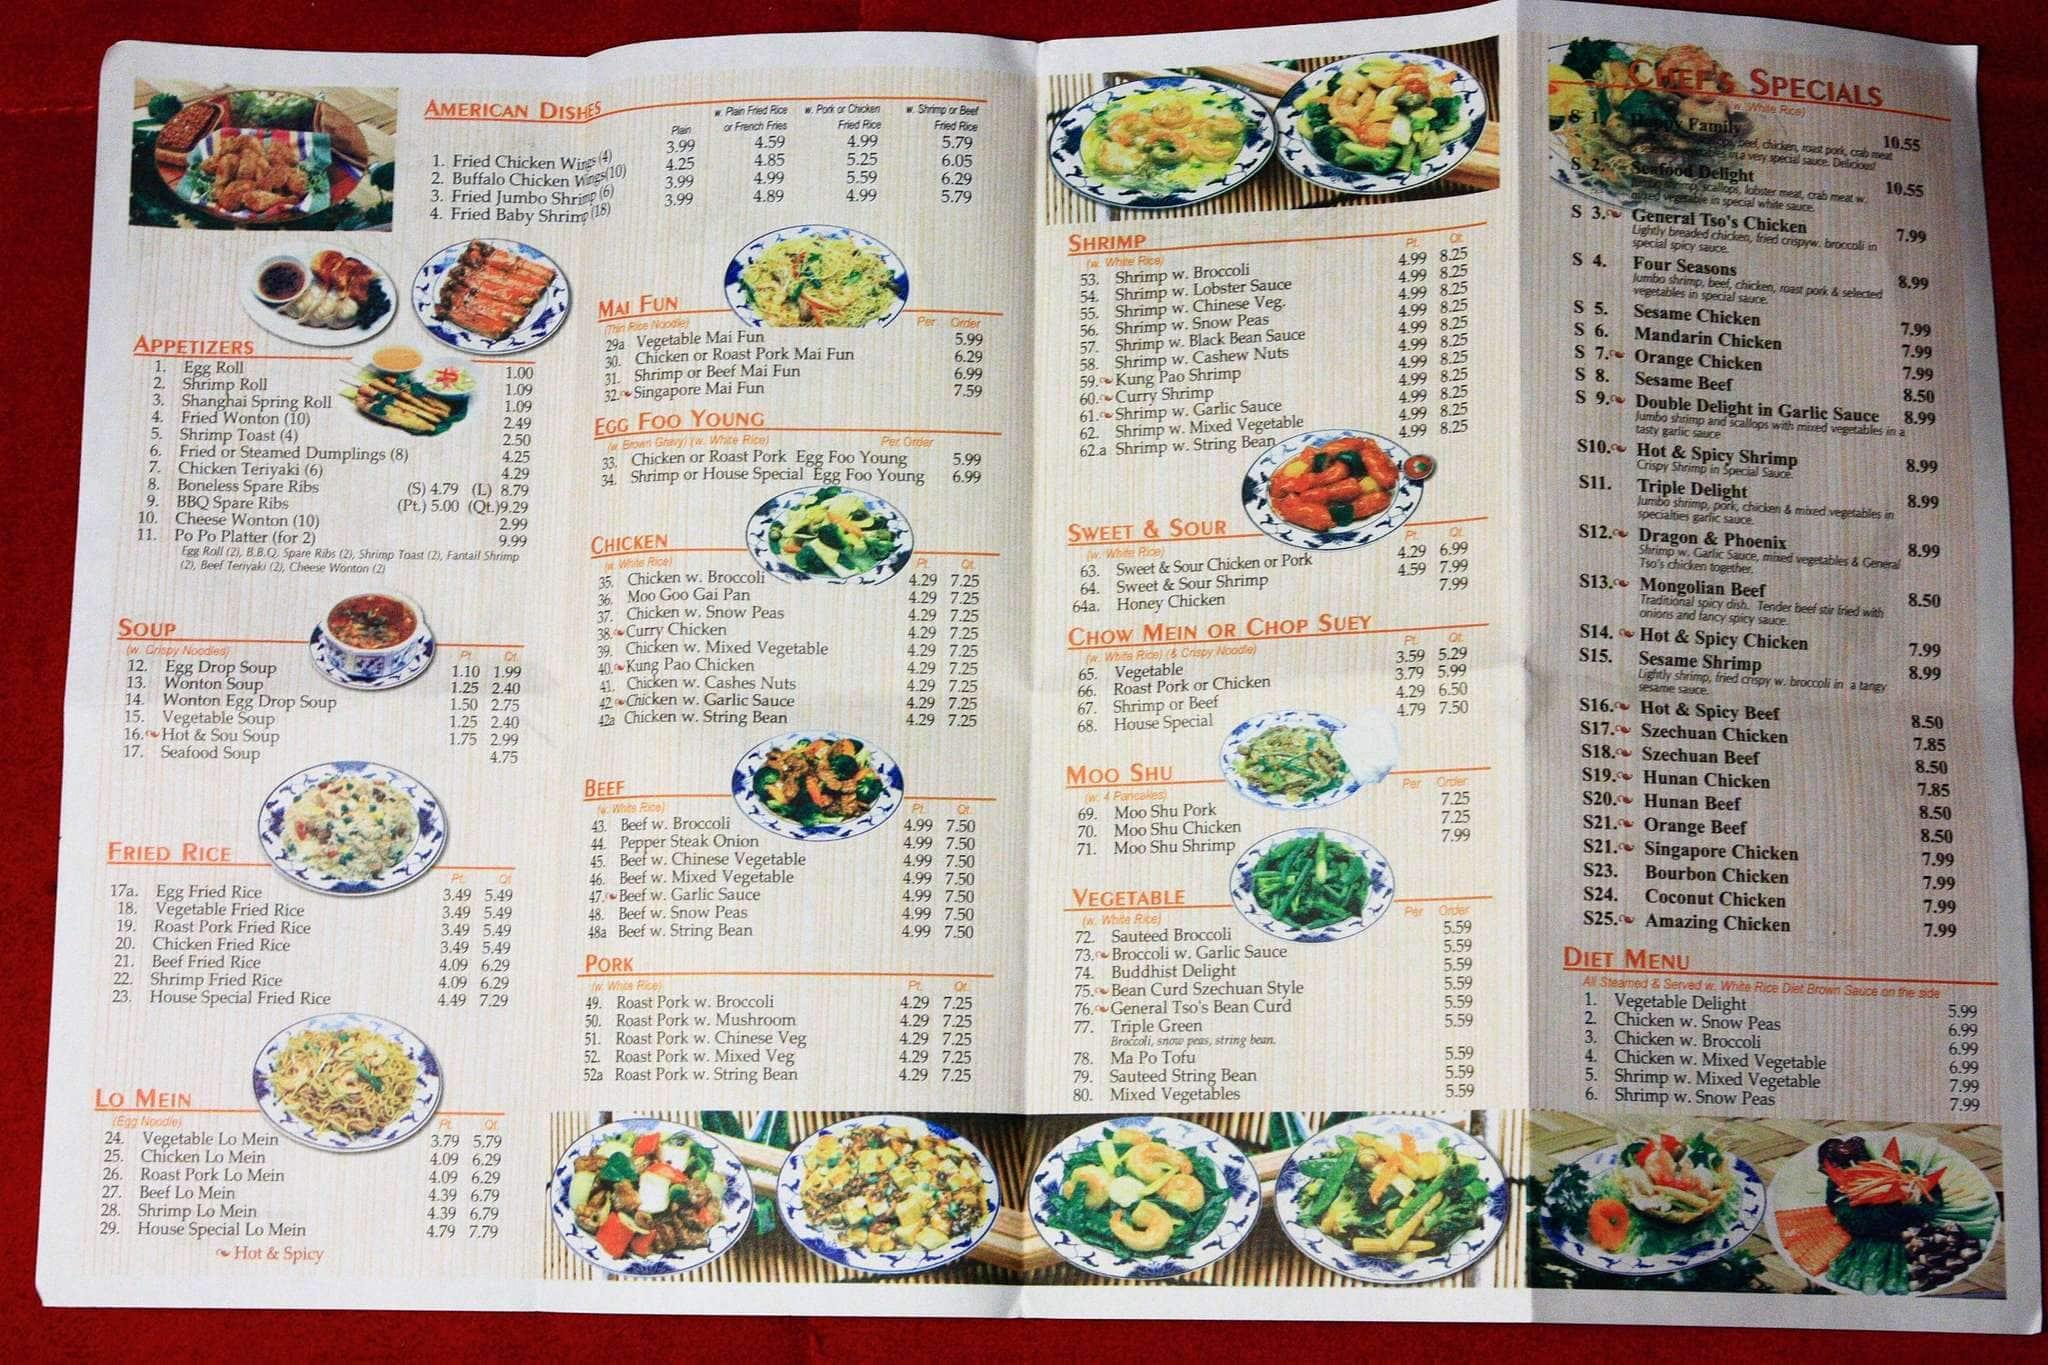 Menu at Nine Dragon Chinese restaurant, Baton Rouge